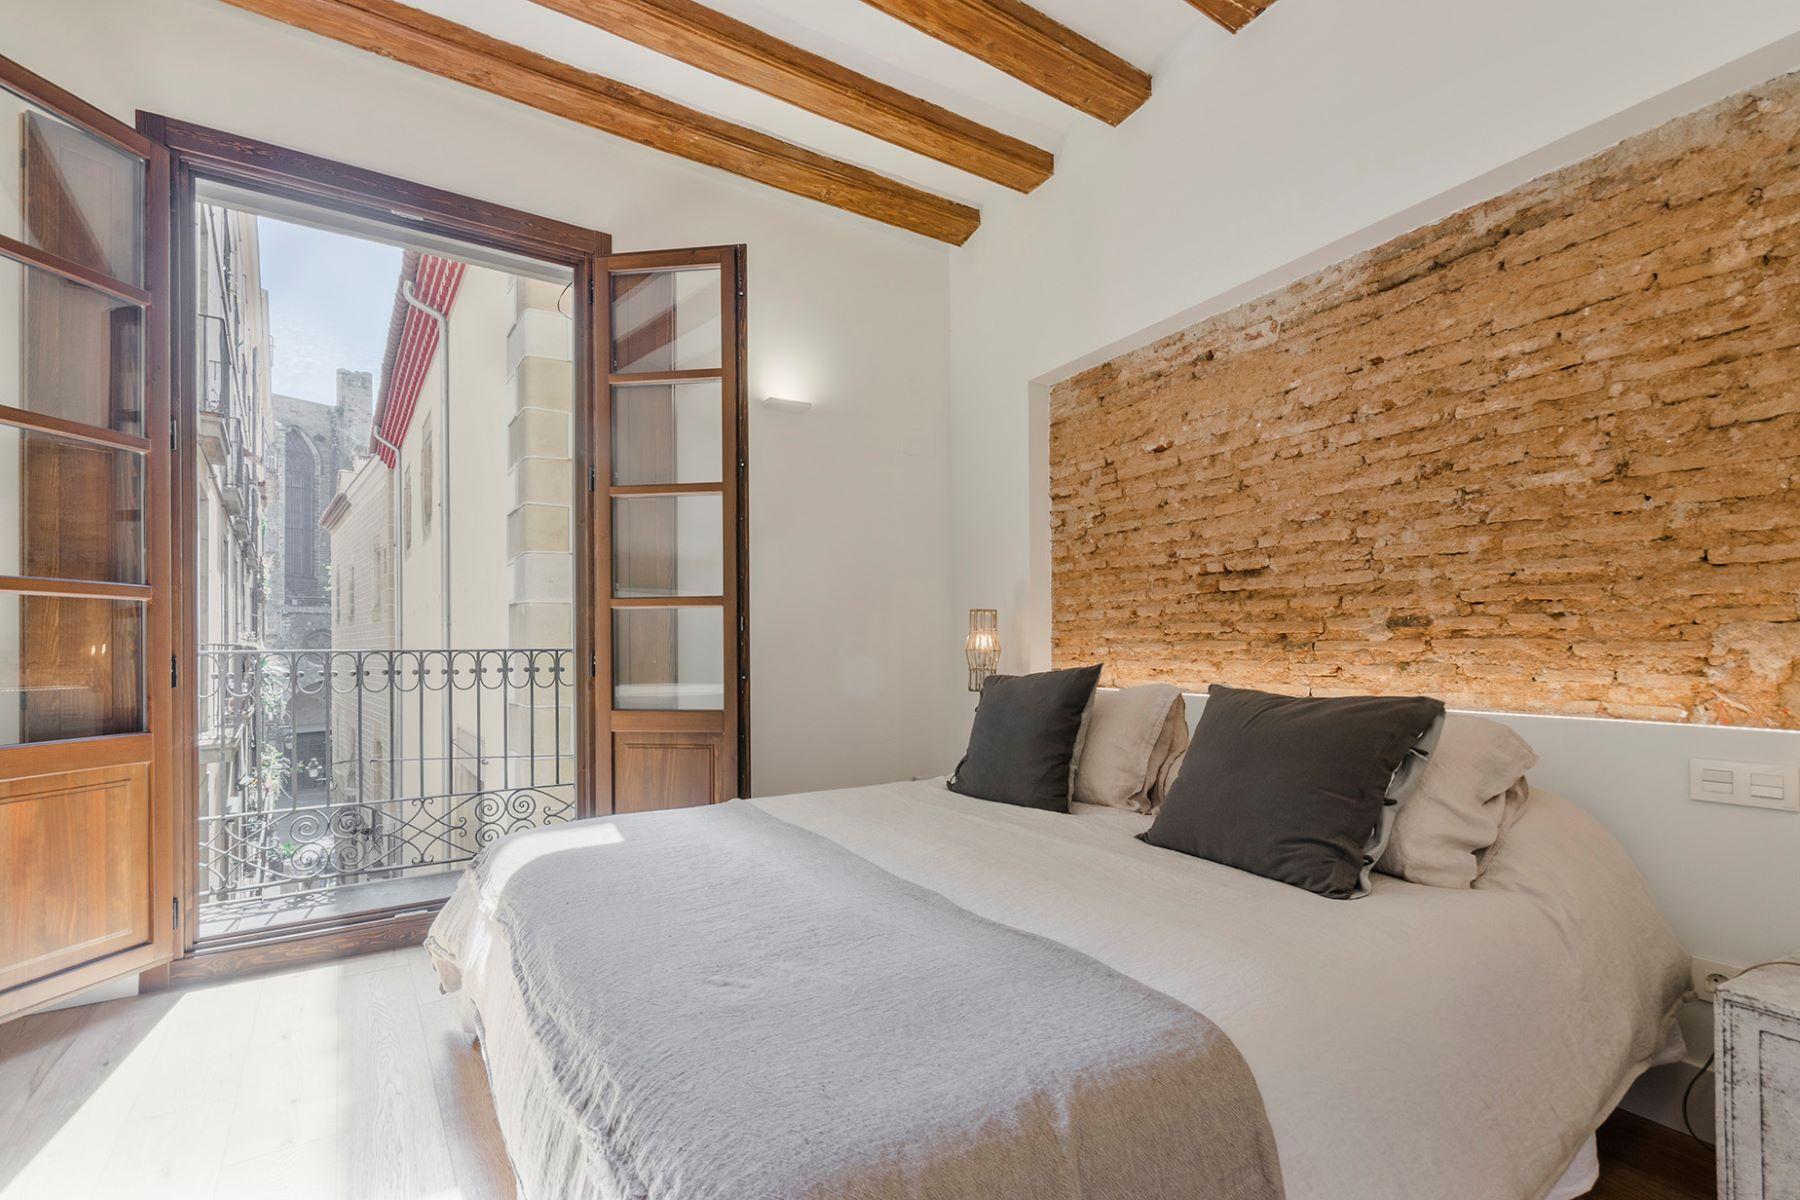 Apartamento por un Venta en Two Bedrooms Brand New Apartment Barcelona City, Barcelona, 08002 España